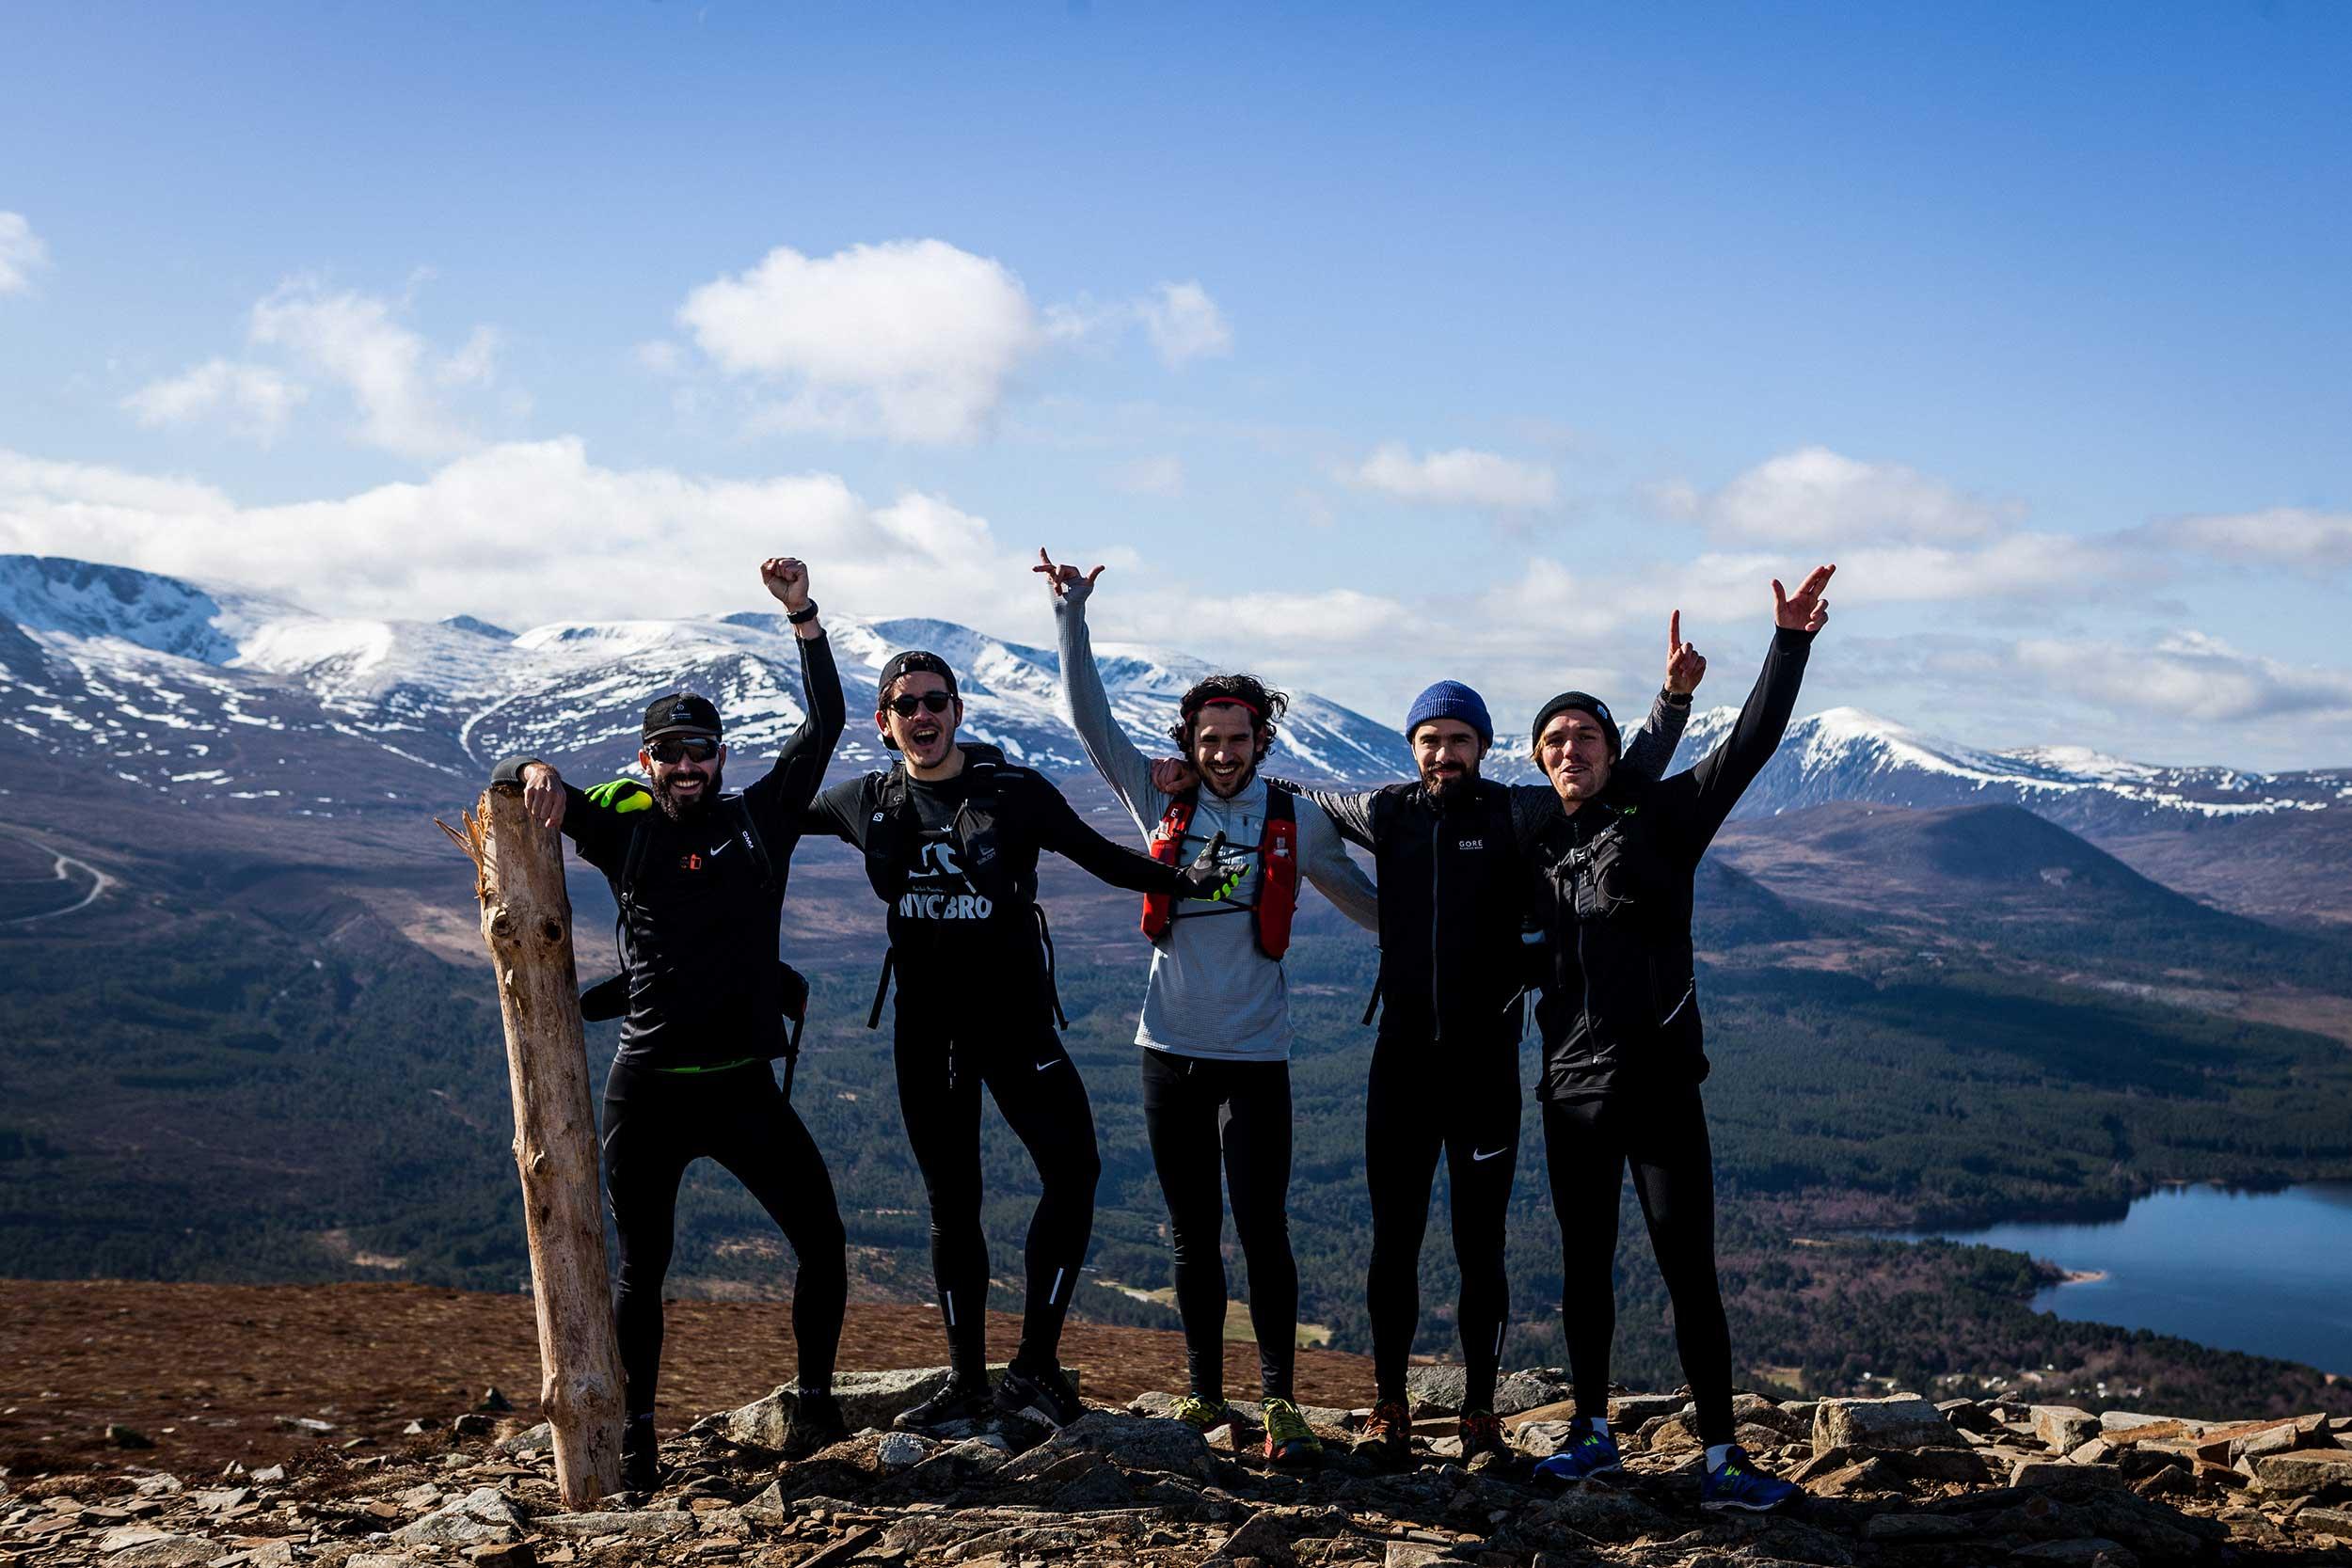 Lochran+and+Light+Scotland+Running+Retreat-56.jpg